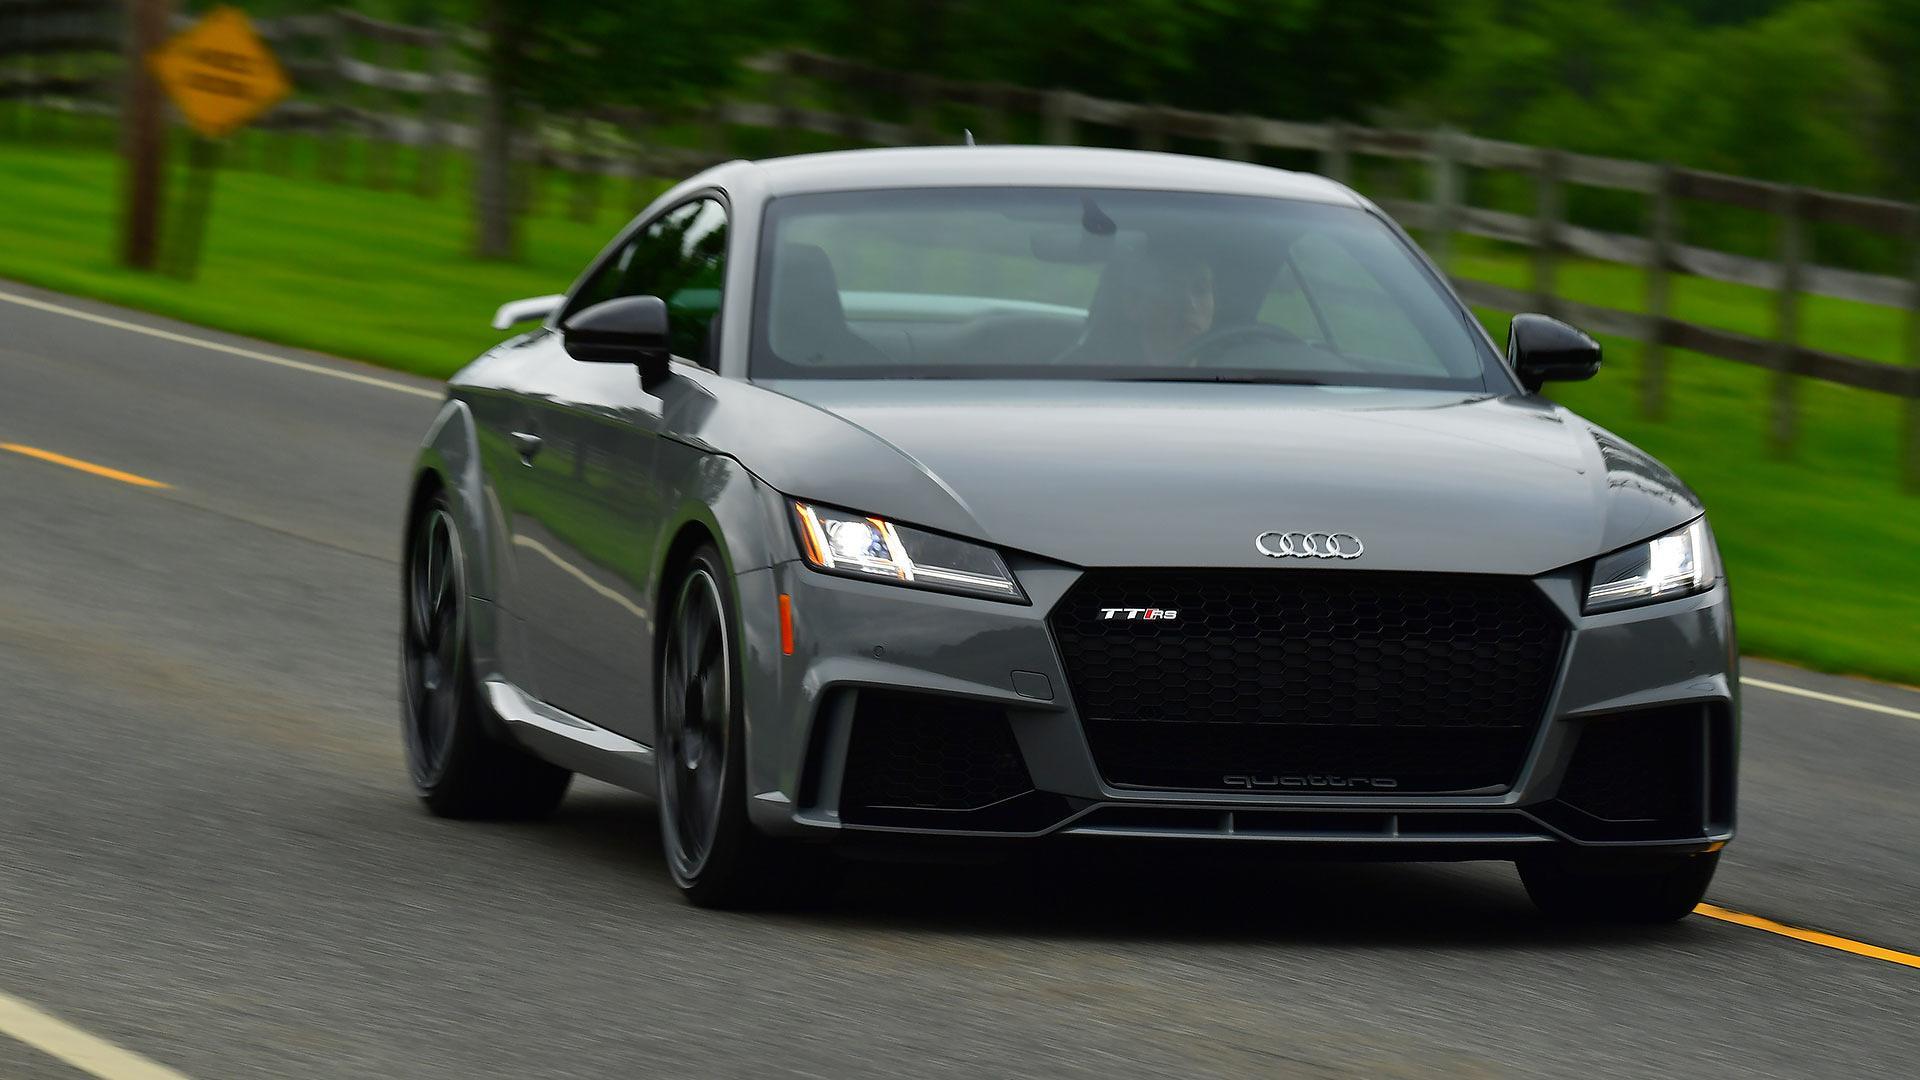 Audi TT RS First Drive The Most Thrilling TT Yet - 2018 audi tt rs